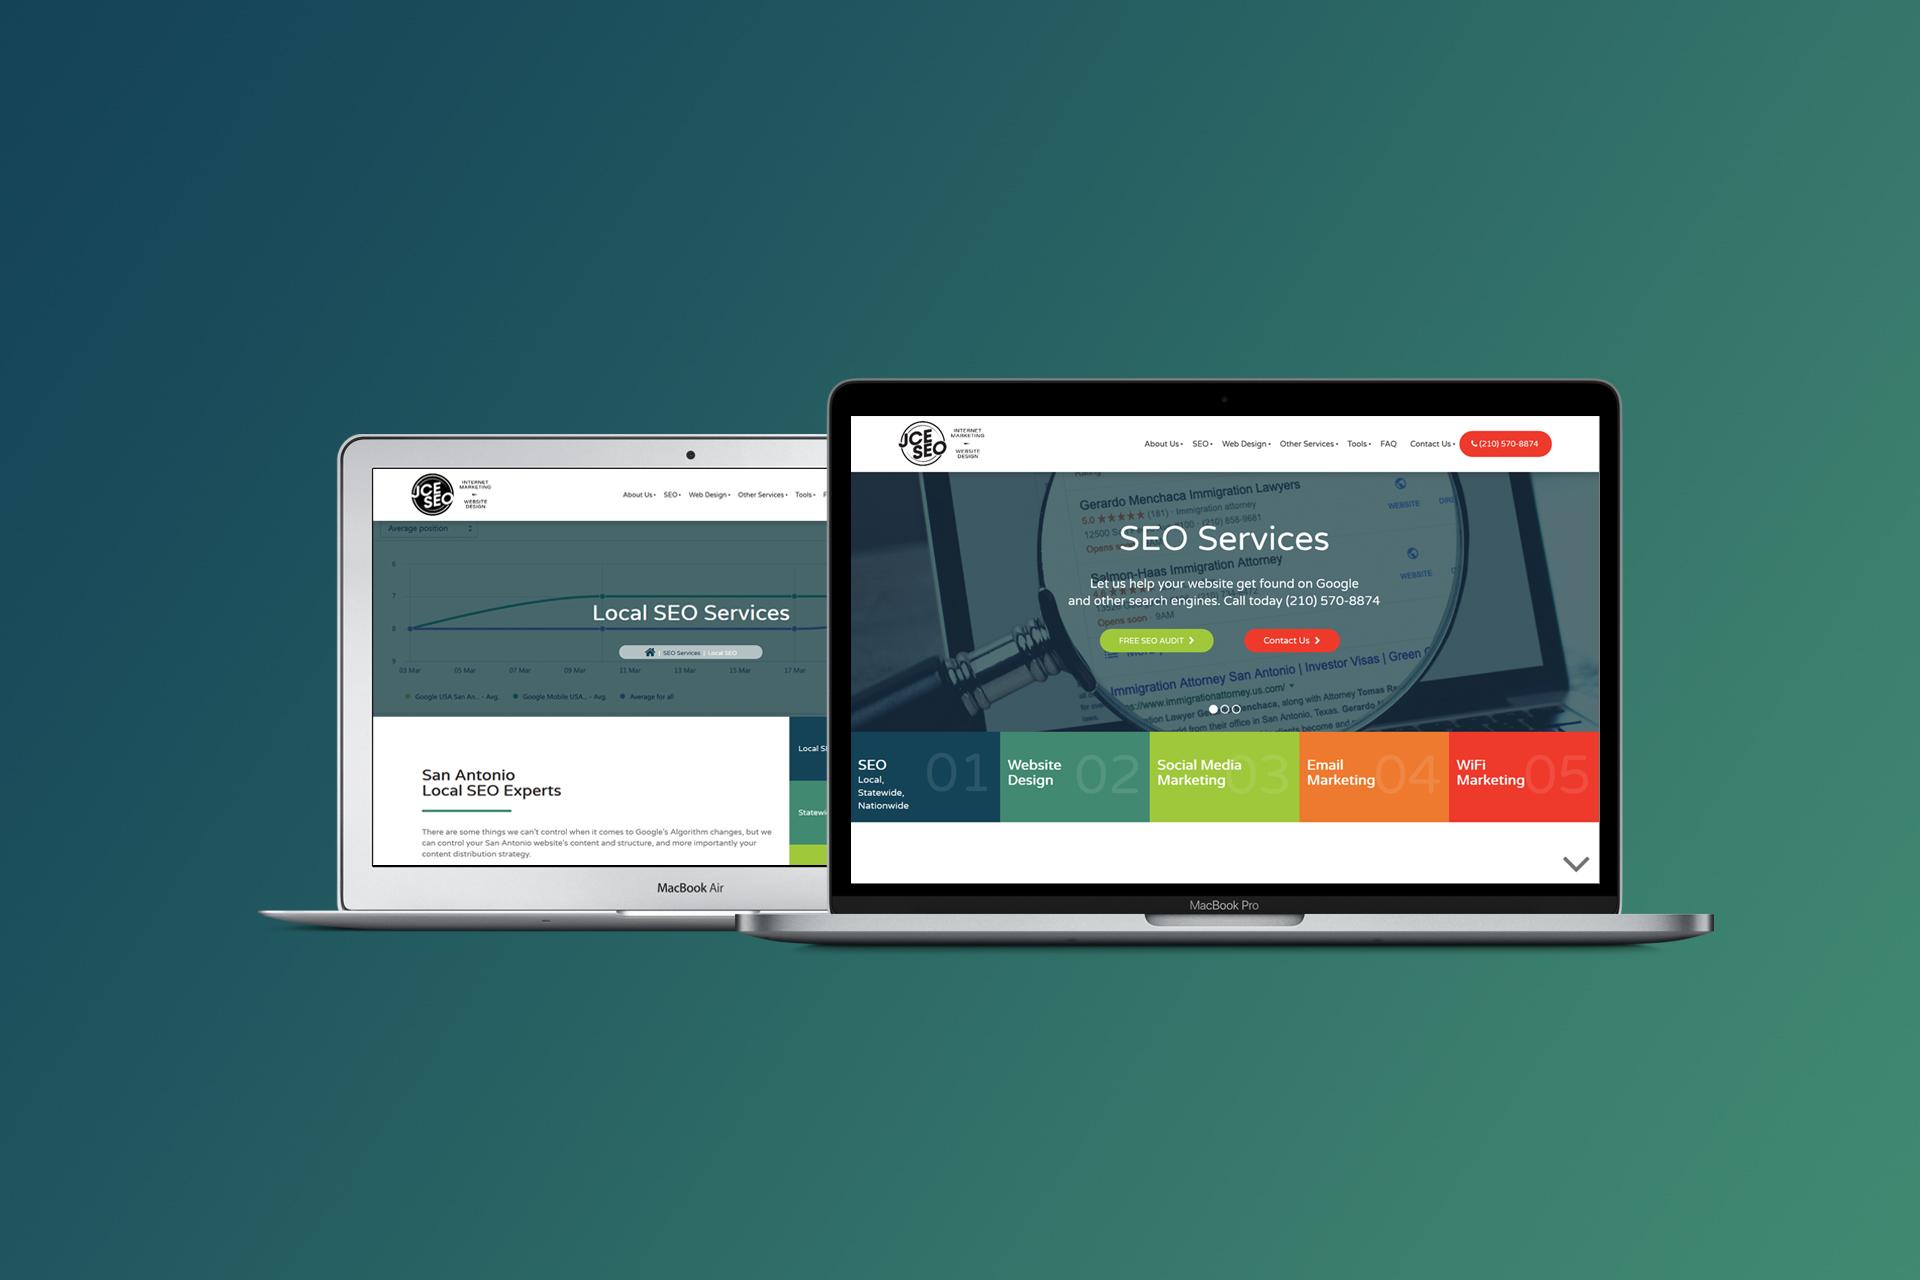 Digital Marketing Agency Website | Web Design and Development | E'finit Media San Antonio